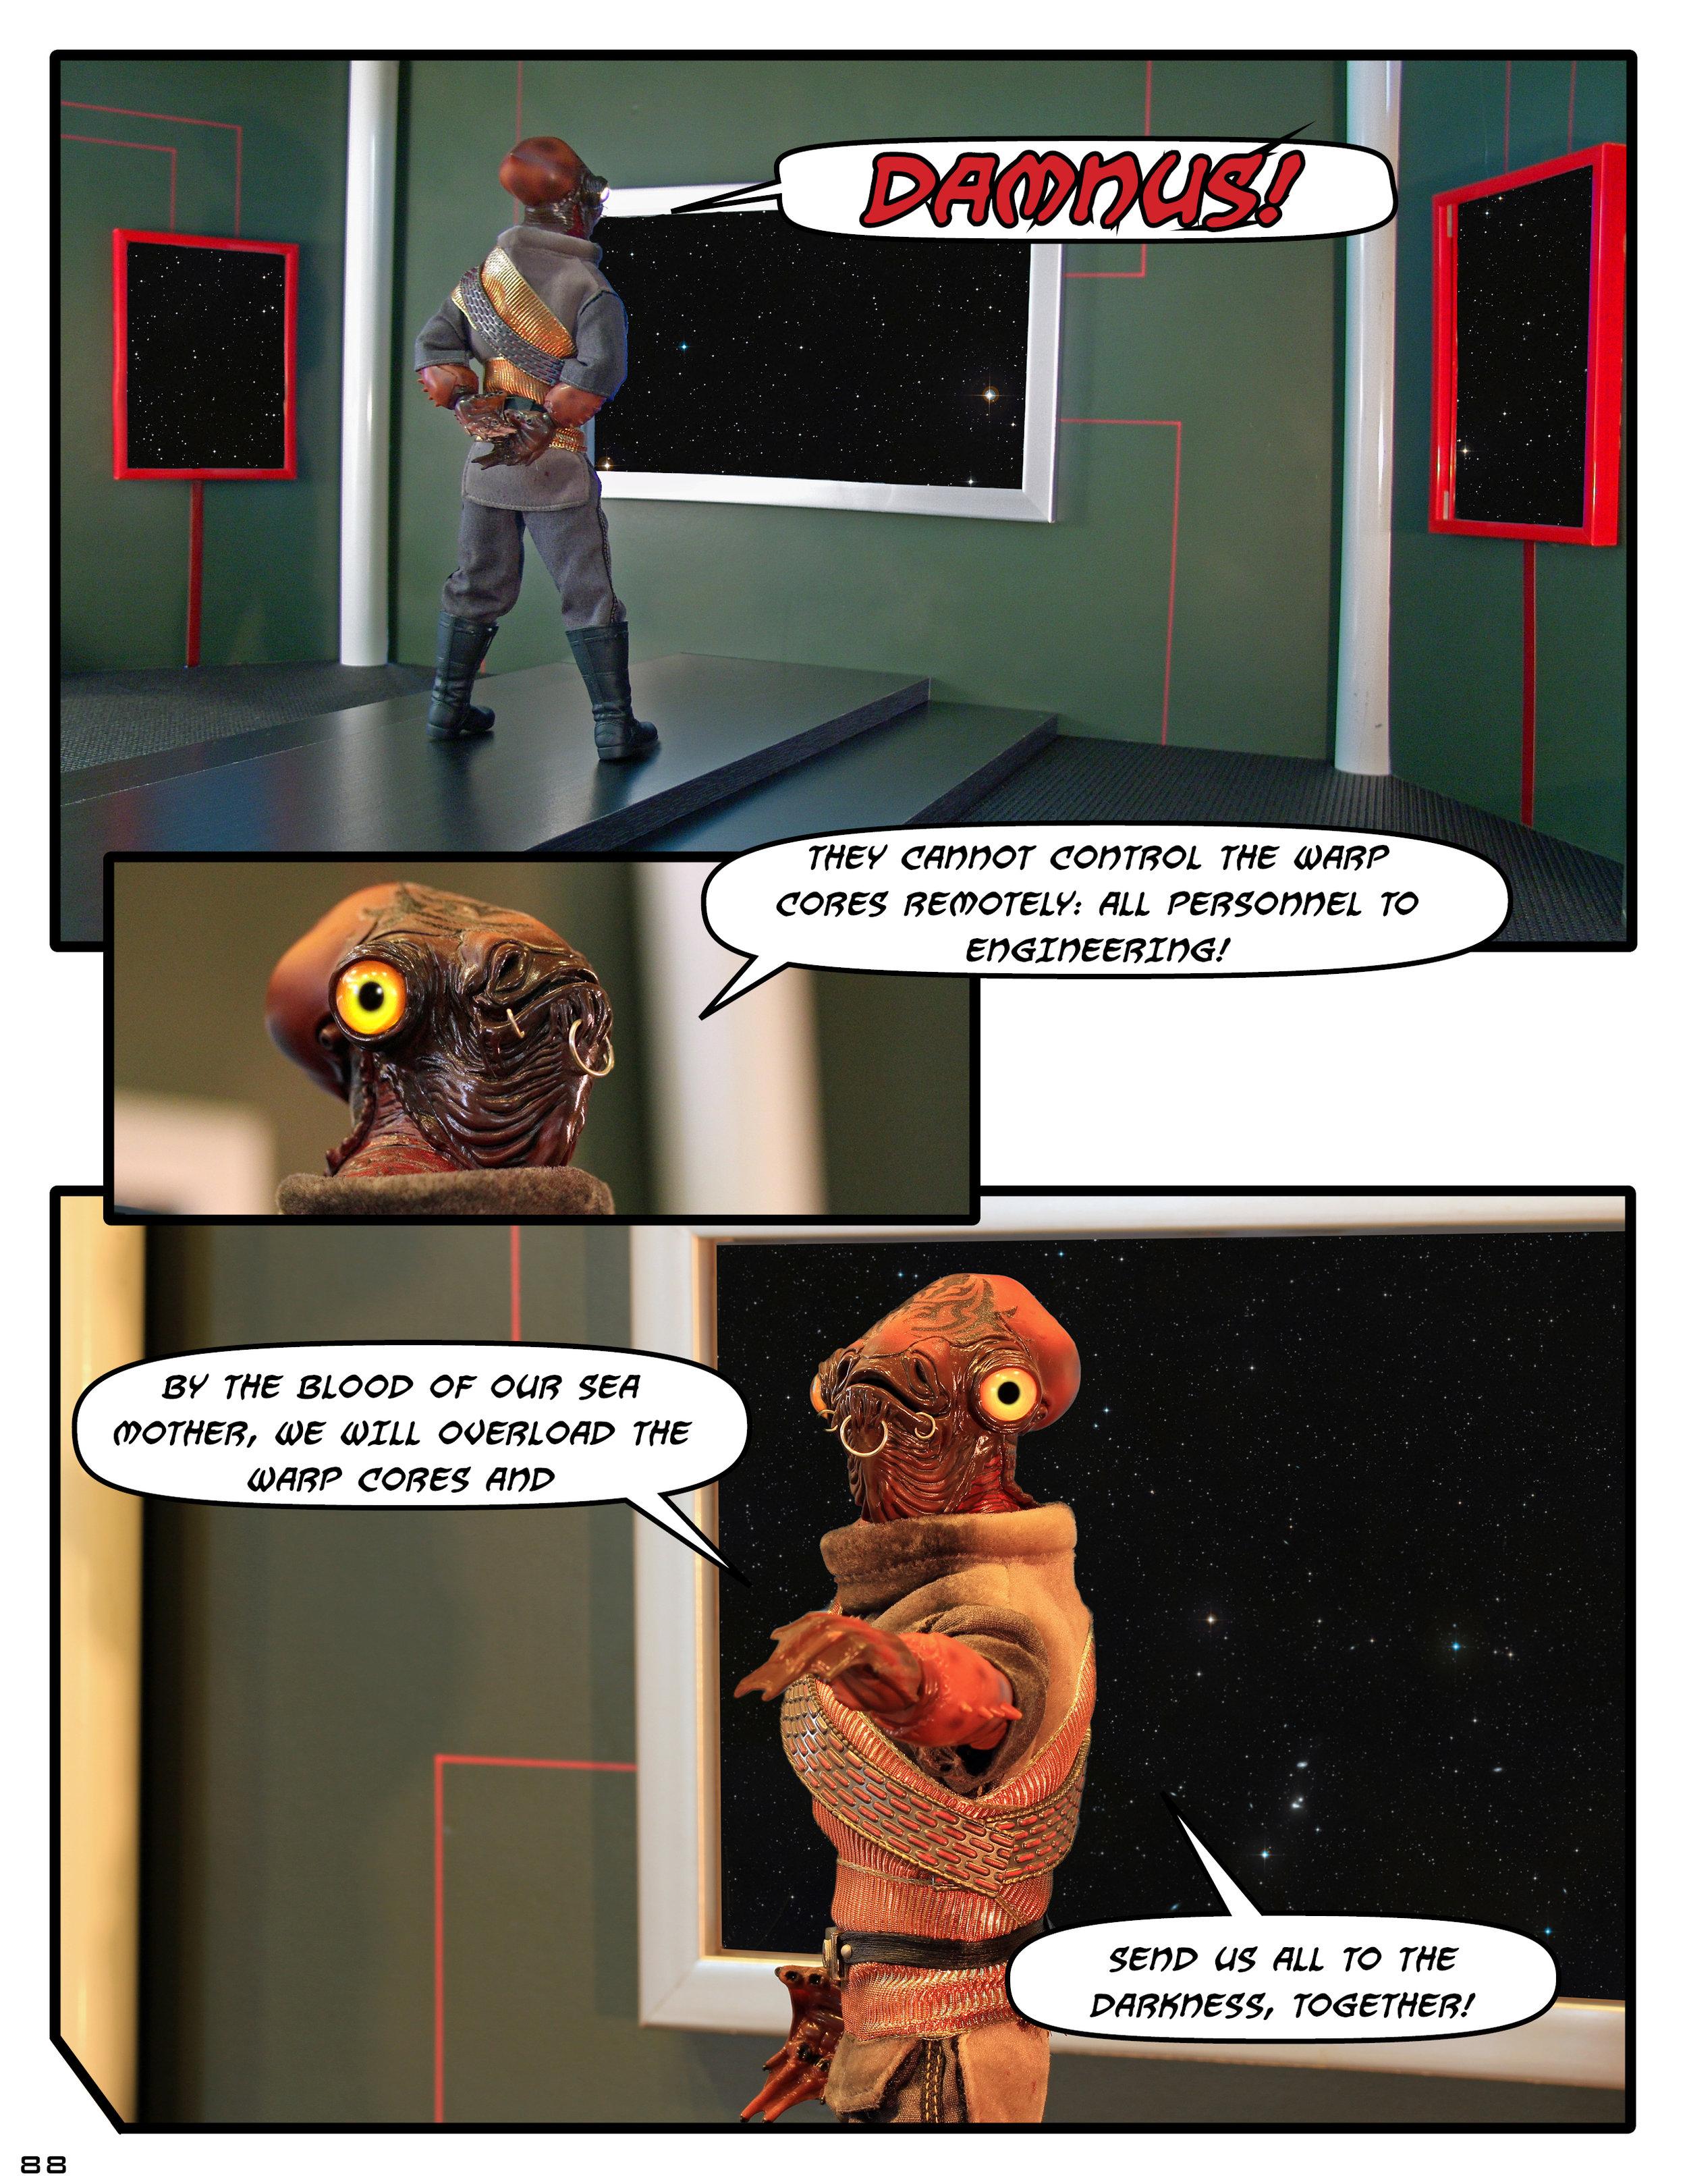 Star Trek_ Battle Logs Pages88.jpg